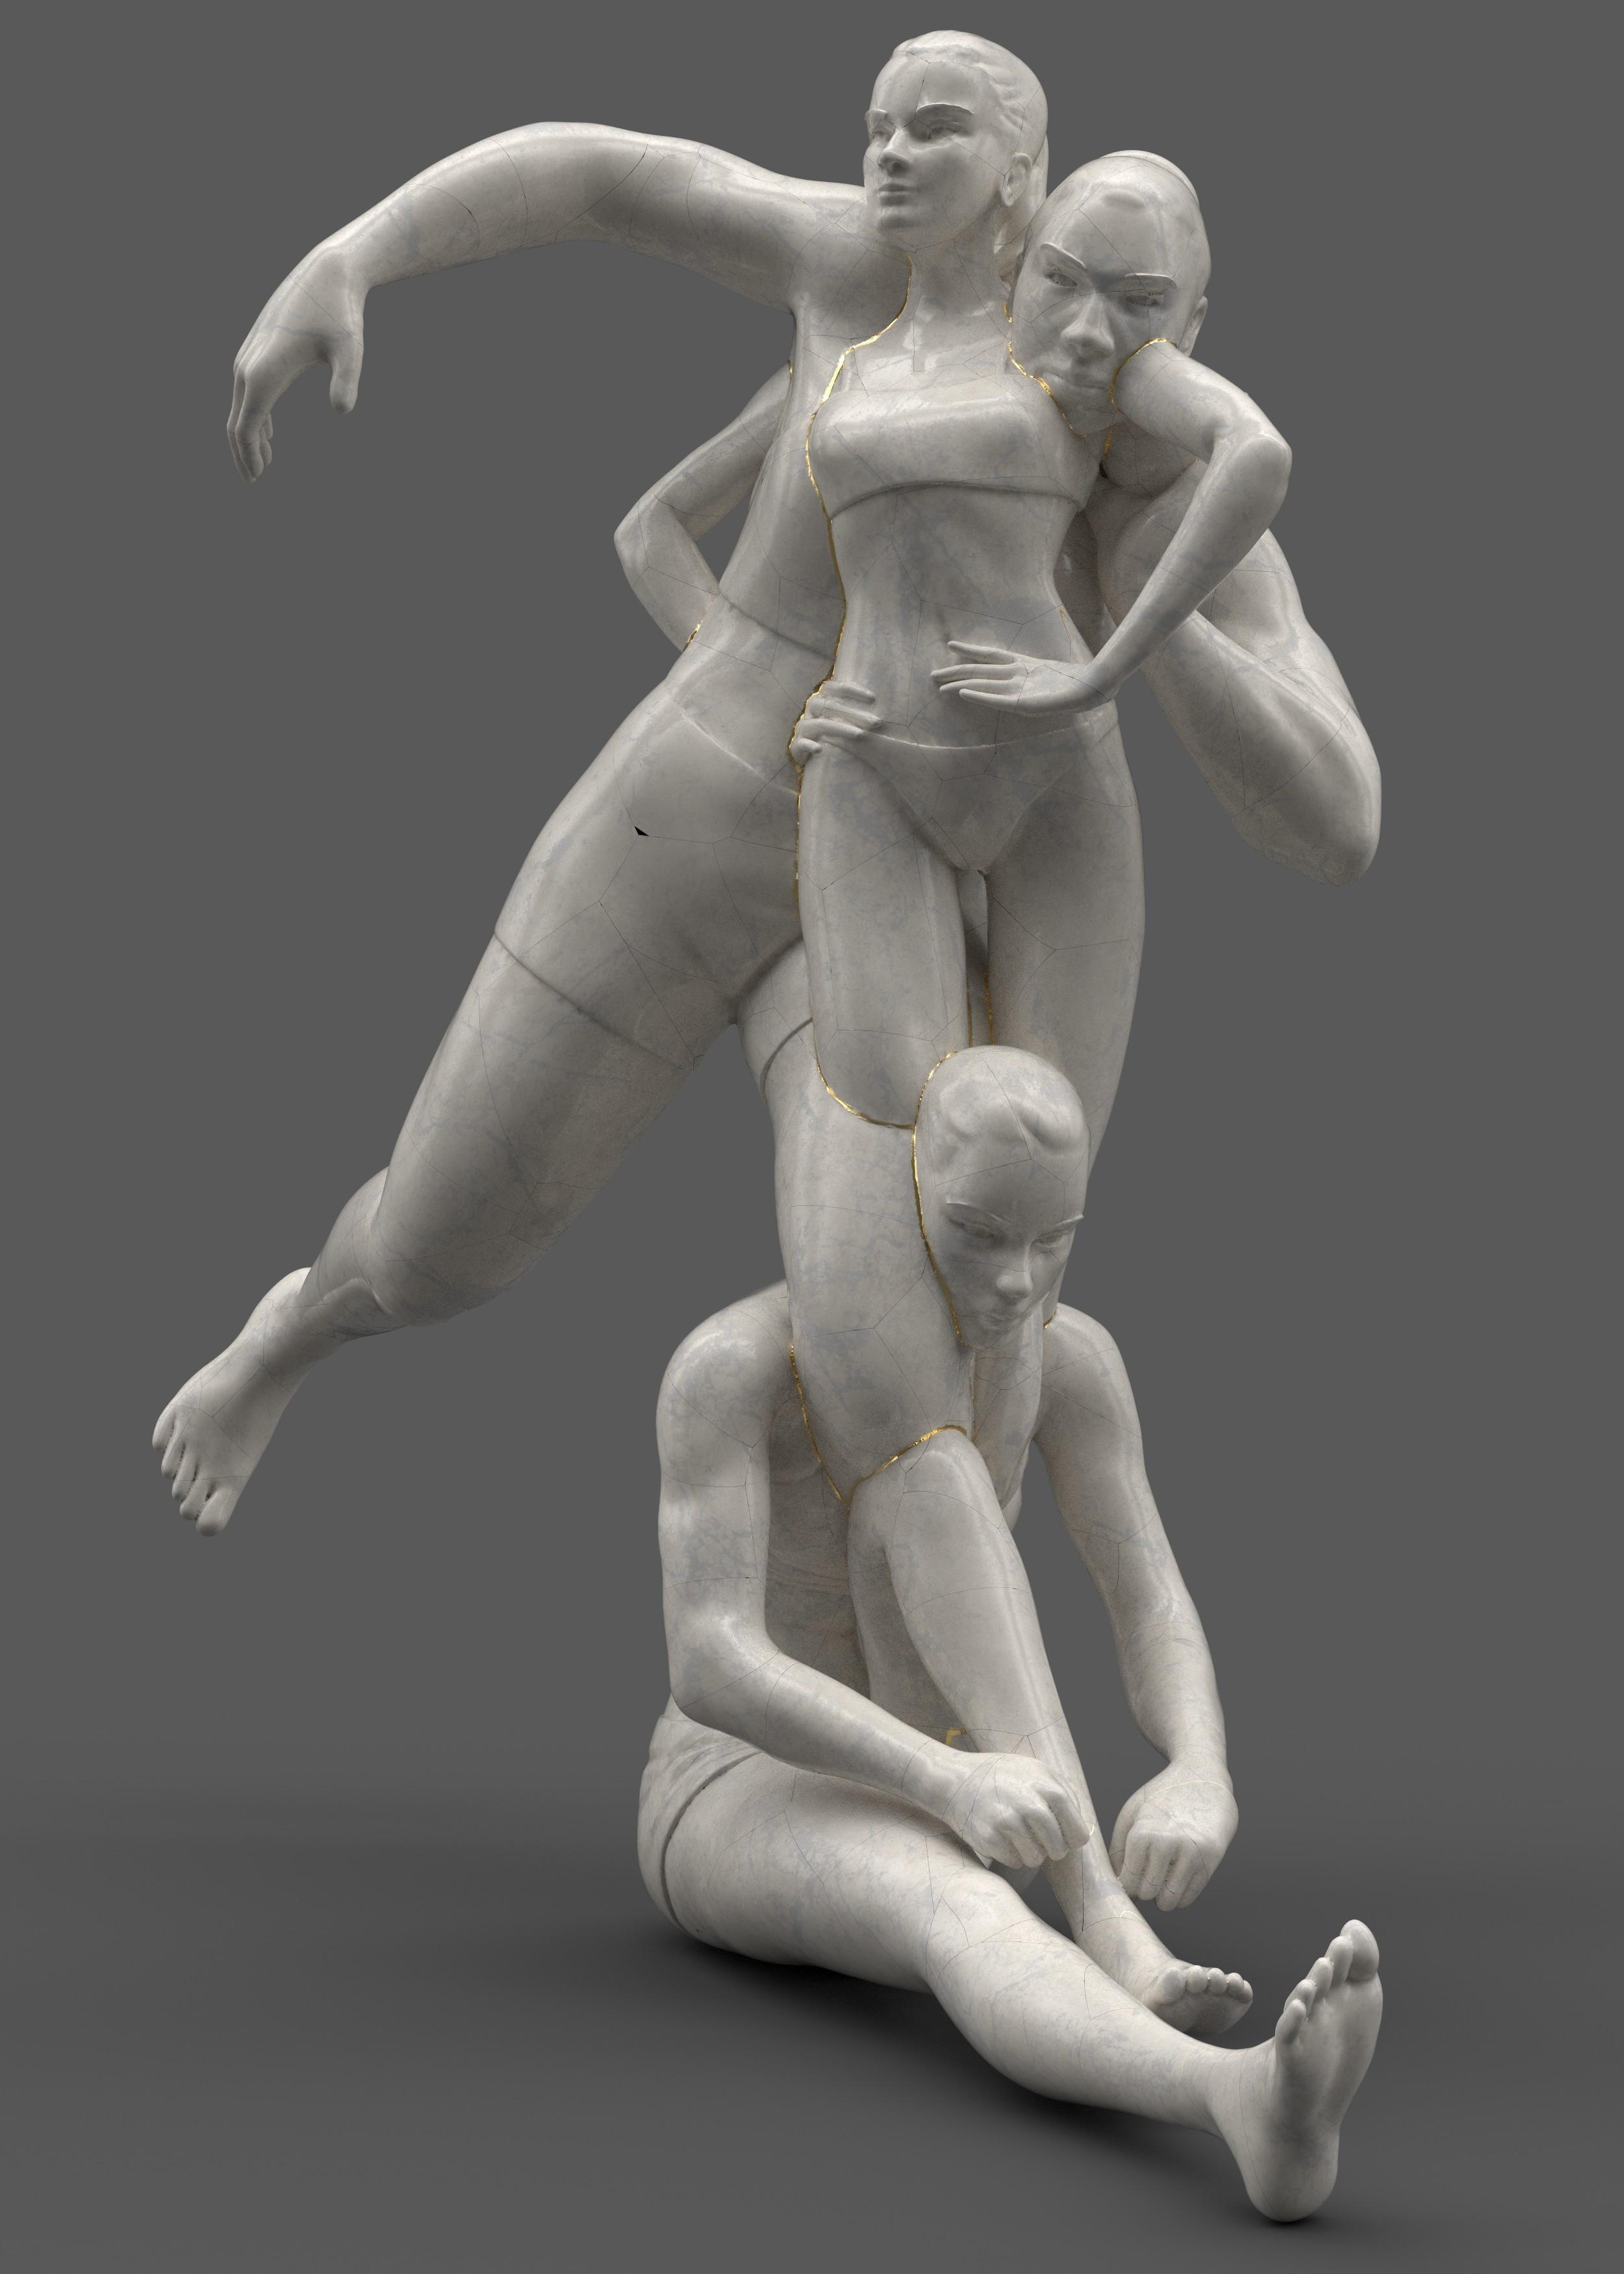 https://ocias.com/blog/chinaware-athletes-new-interactive-artwork/